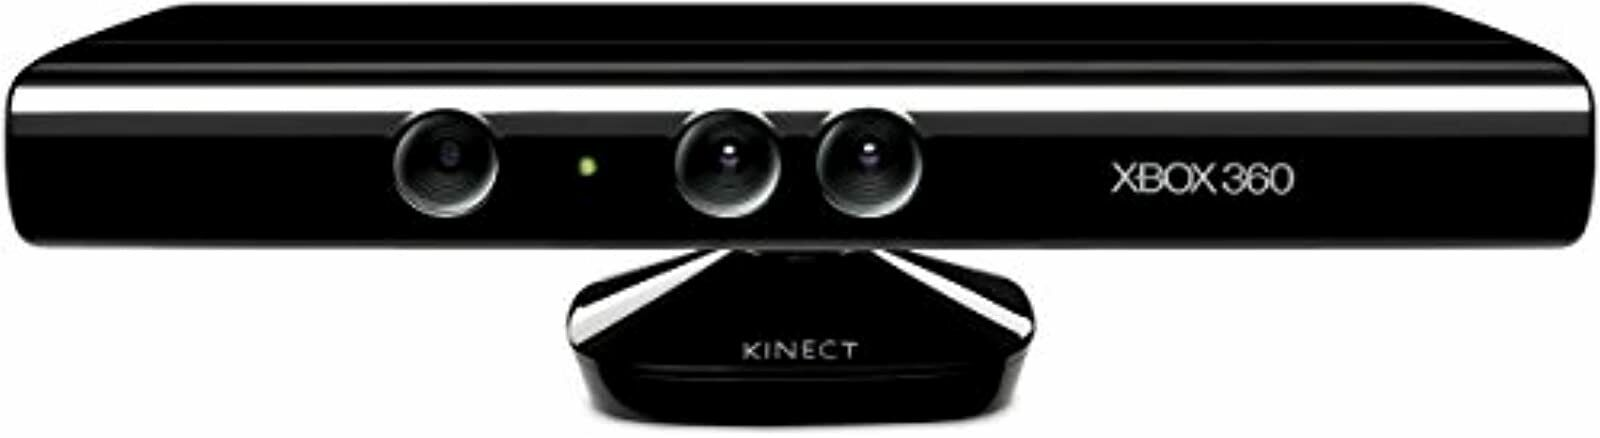 Kinect Sensor For Xbox 360 With Kinect Adventures Very Good